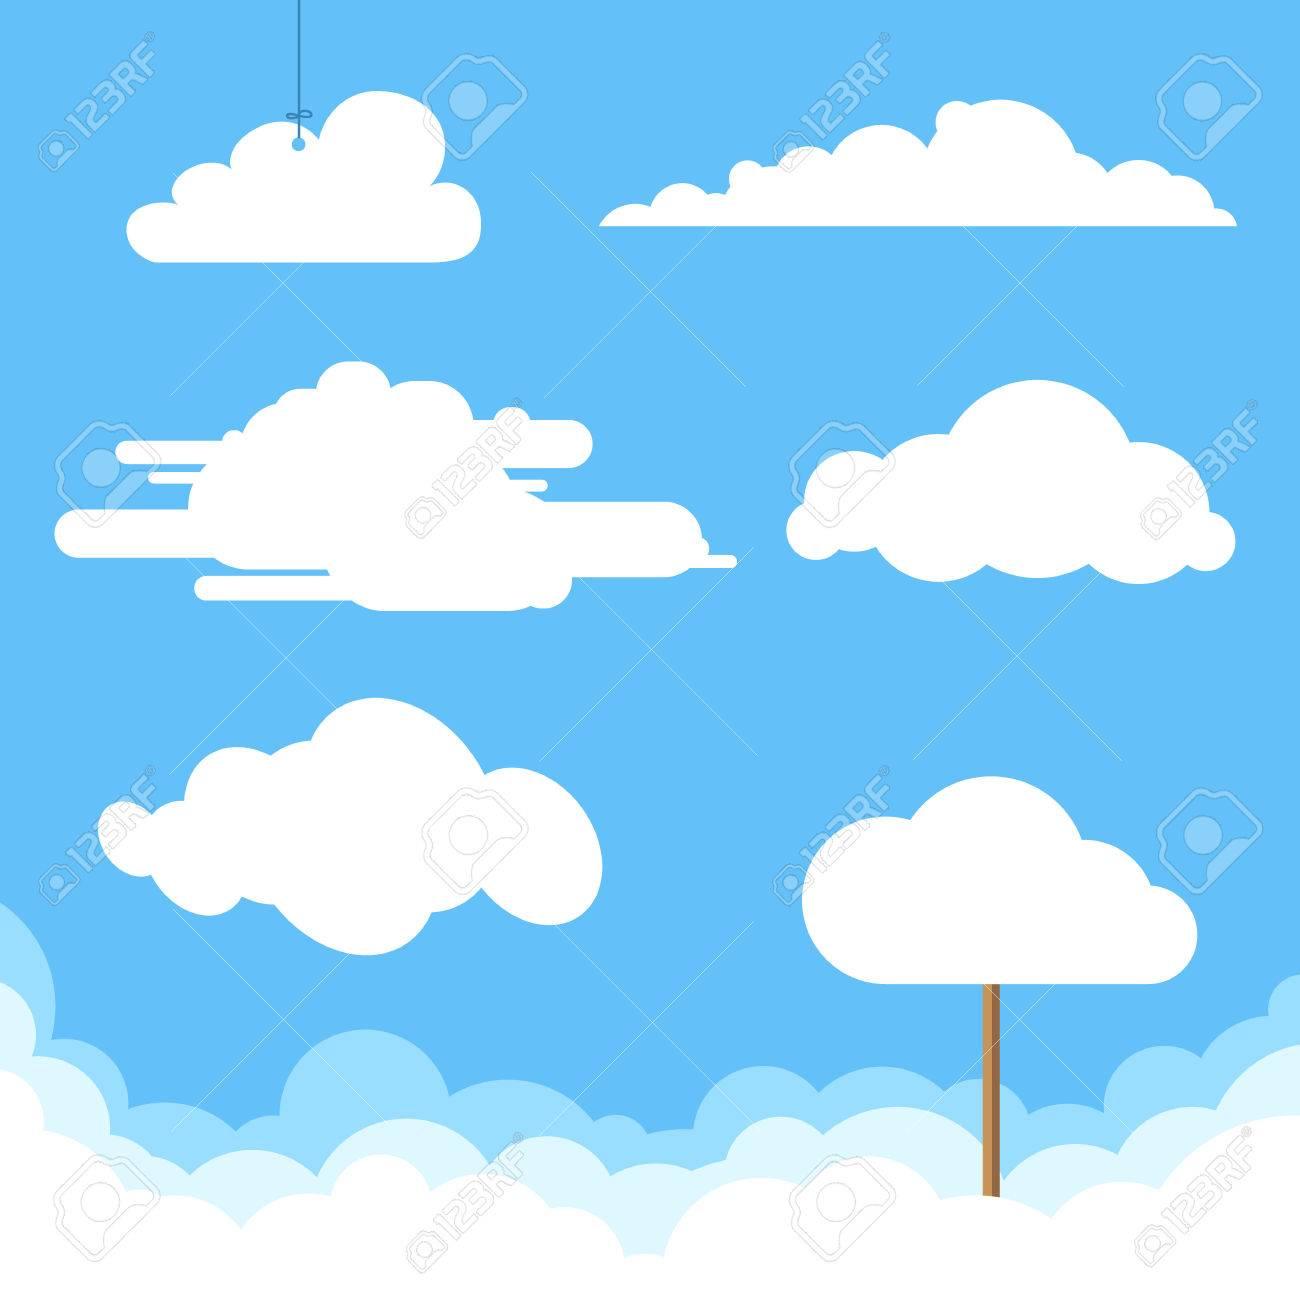 flat design clouds collection vector illustration royalty free rh 123rf com cloud vectors illustrator cloud vectors illustrator